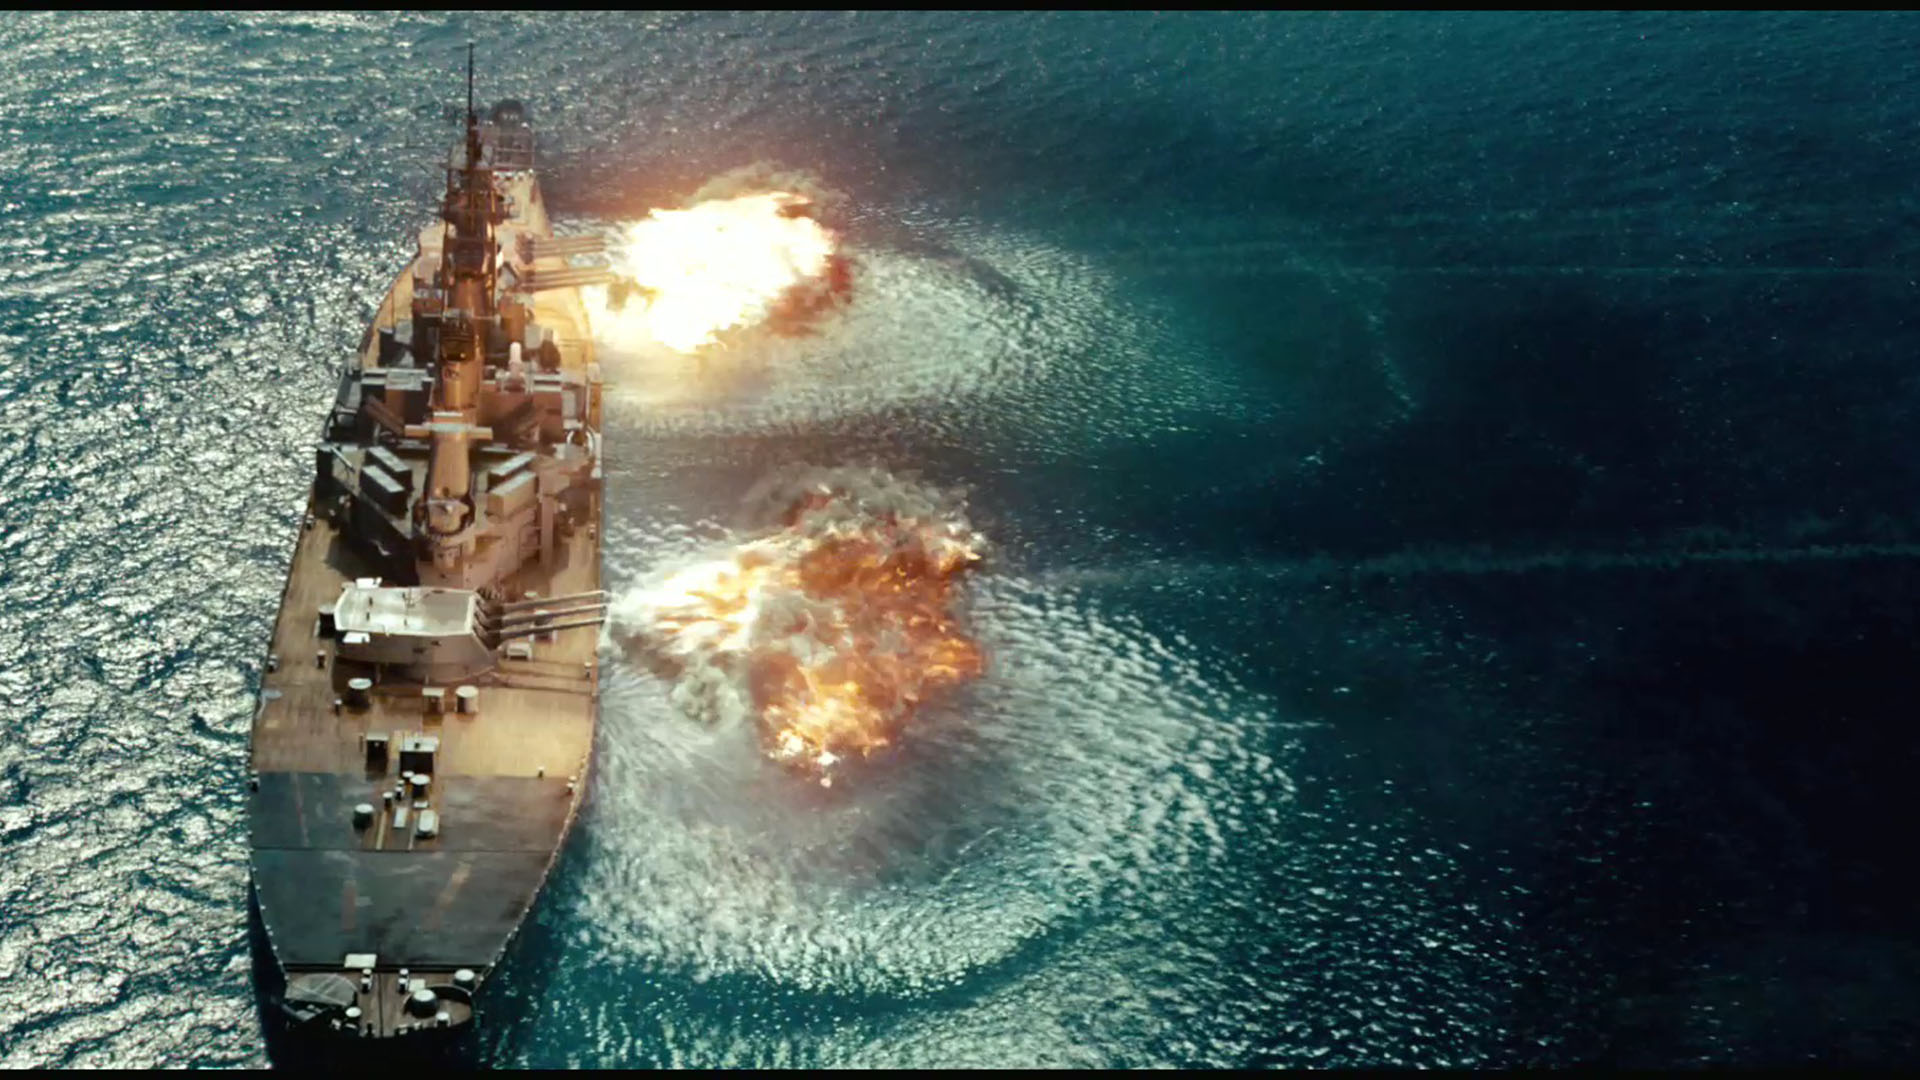 battleship 2012 movie hd - photo #22